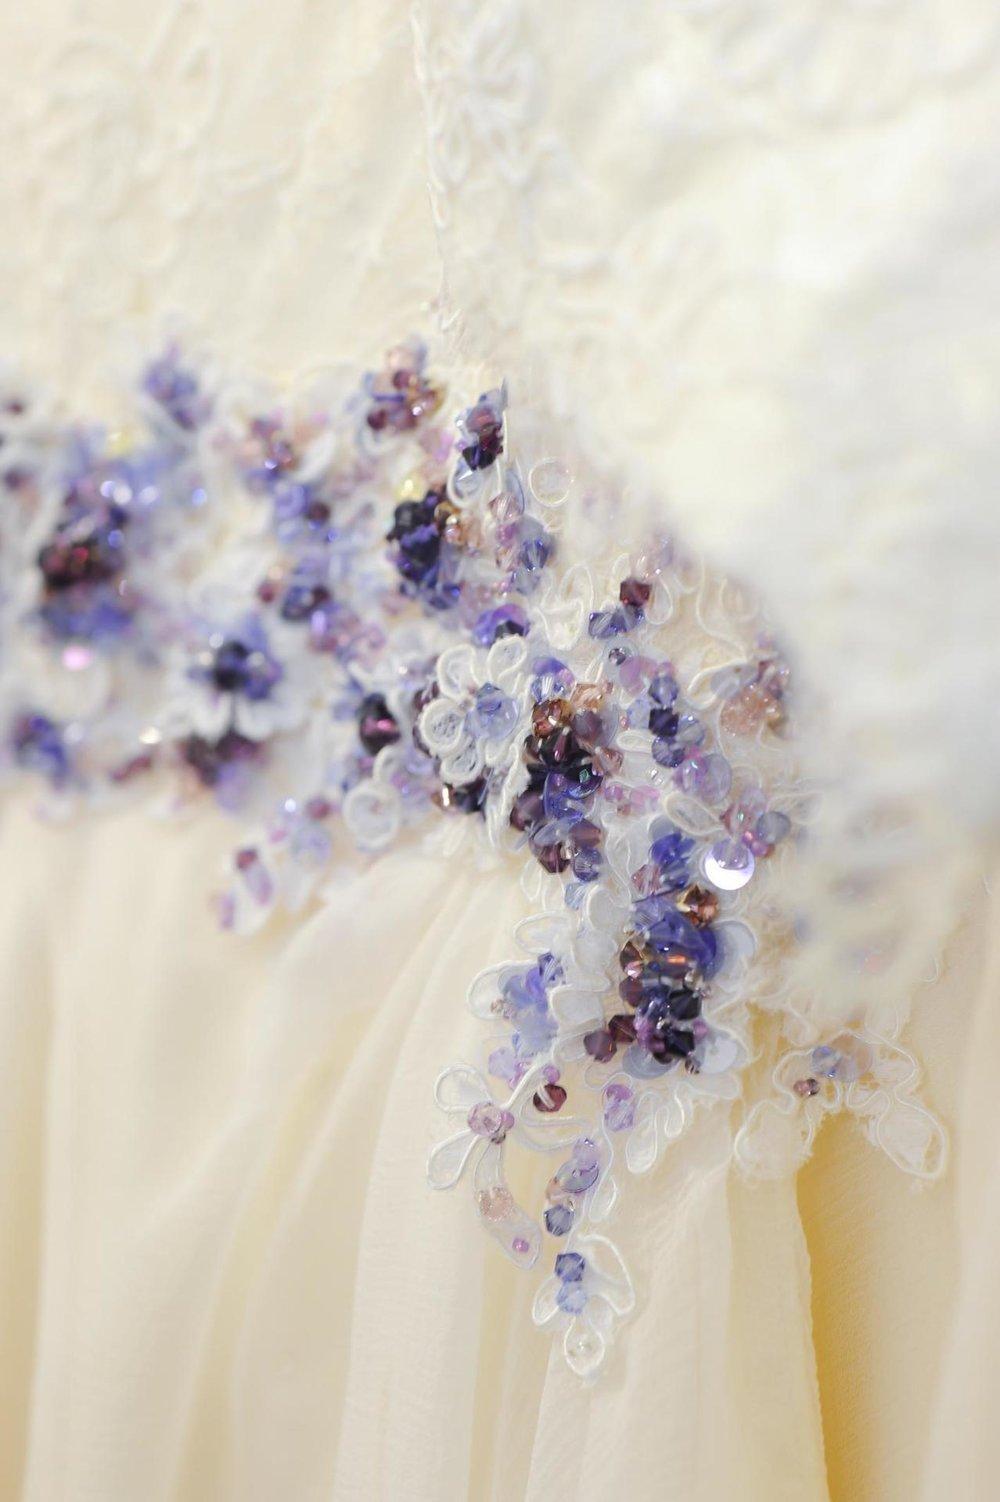 purple swarovski crystal wedding dress detail